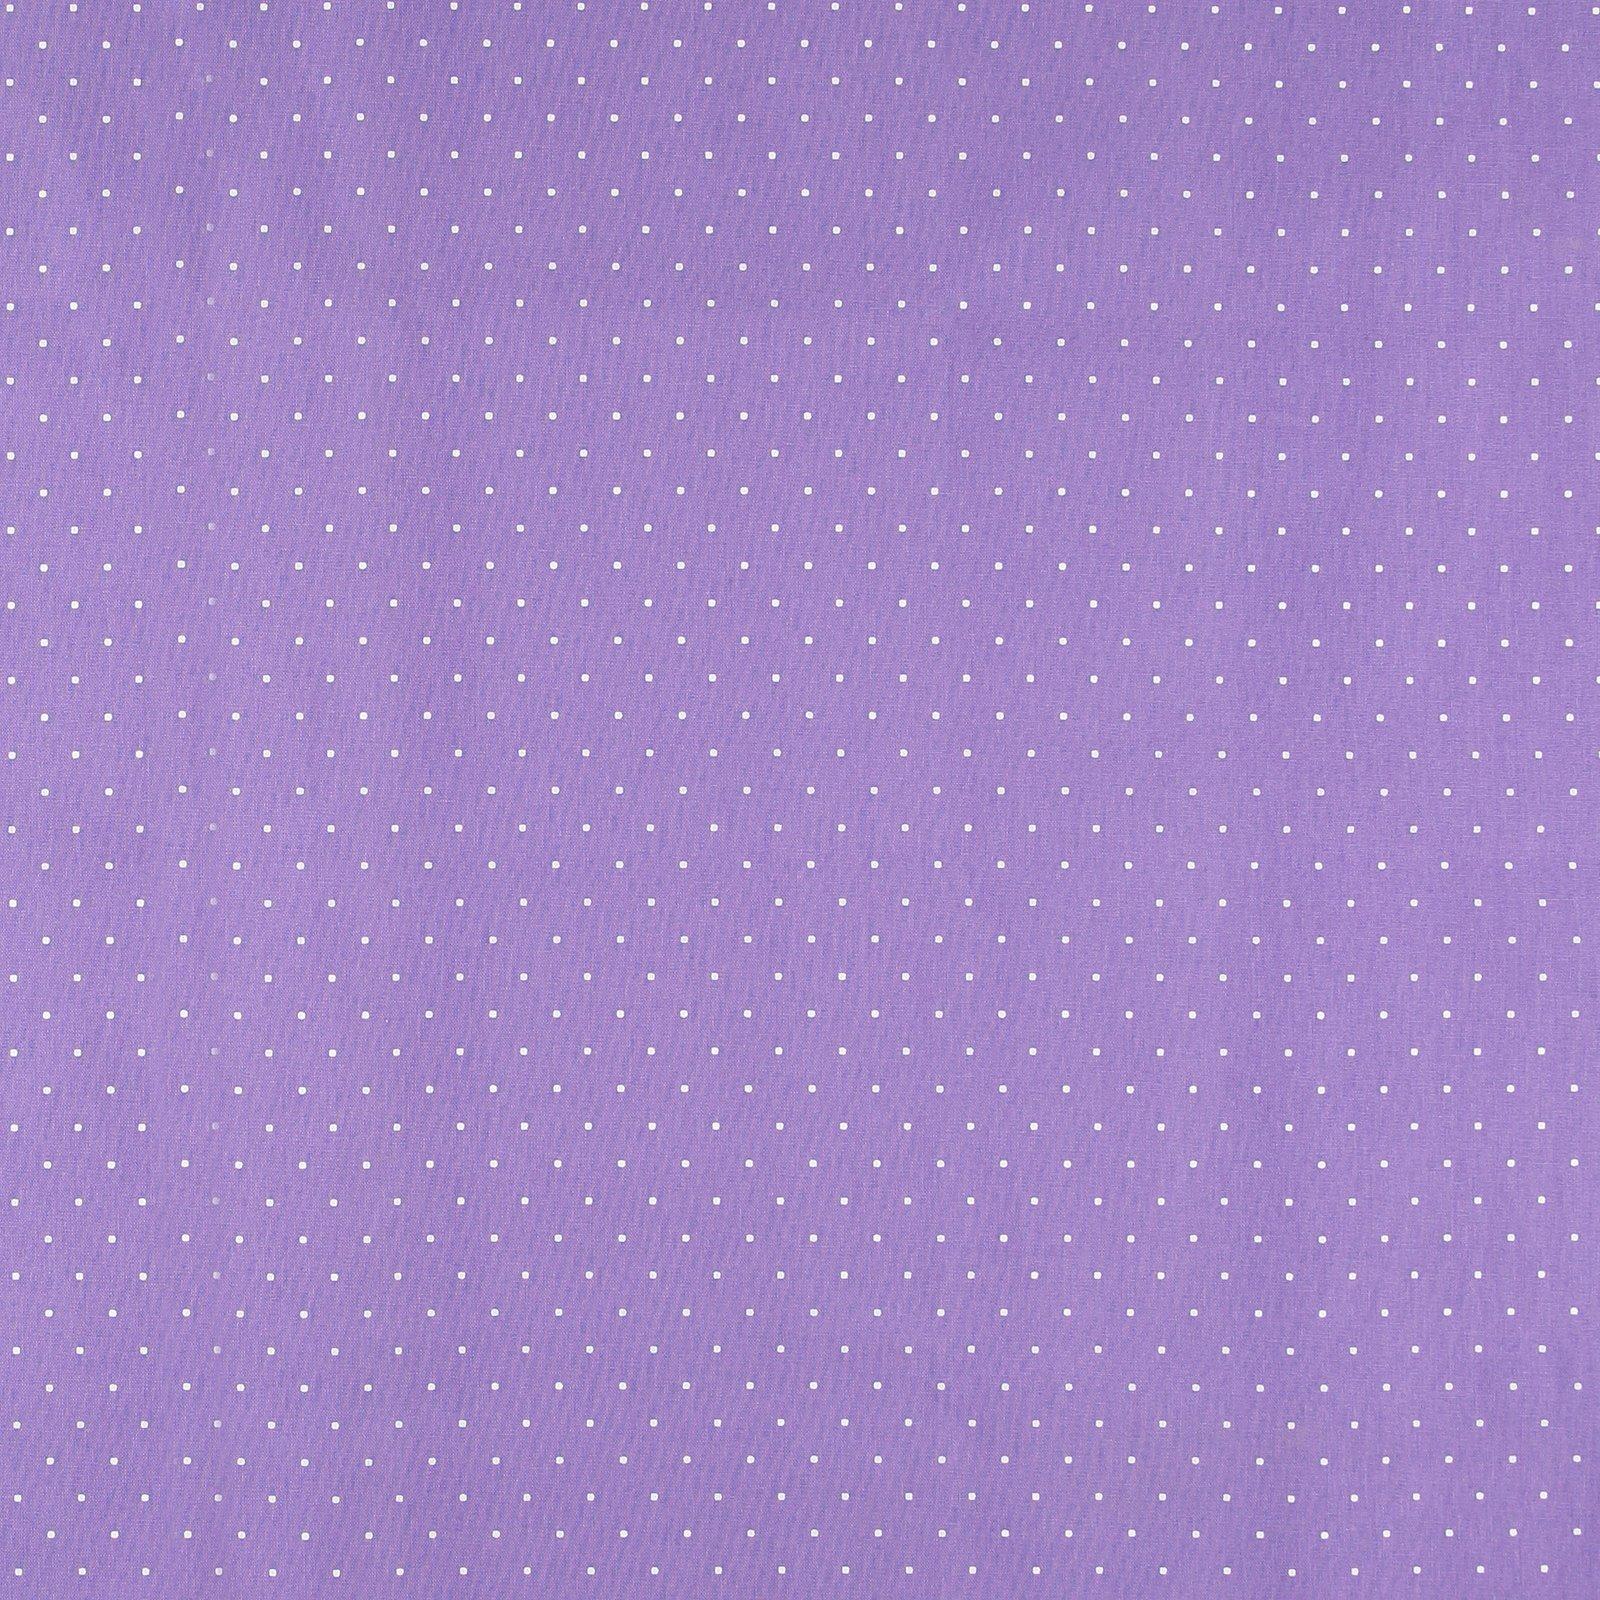 Half panama dark lavender with dots 816218_pack_sp